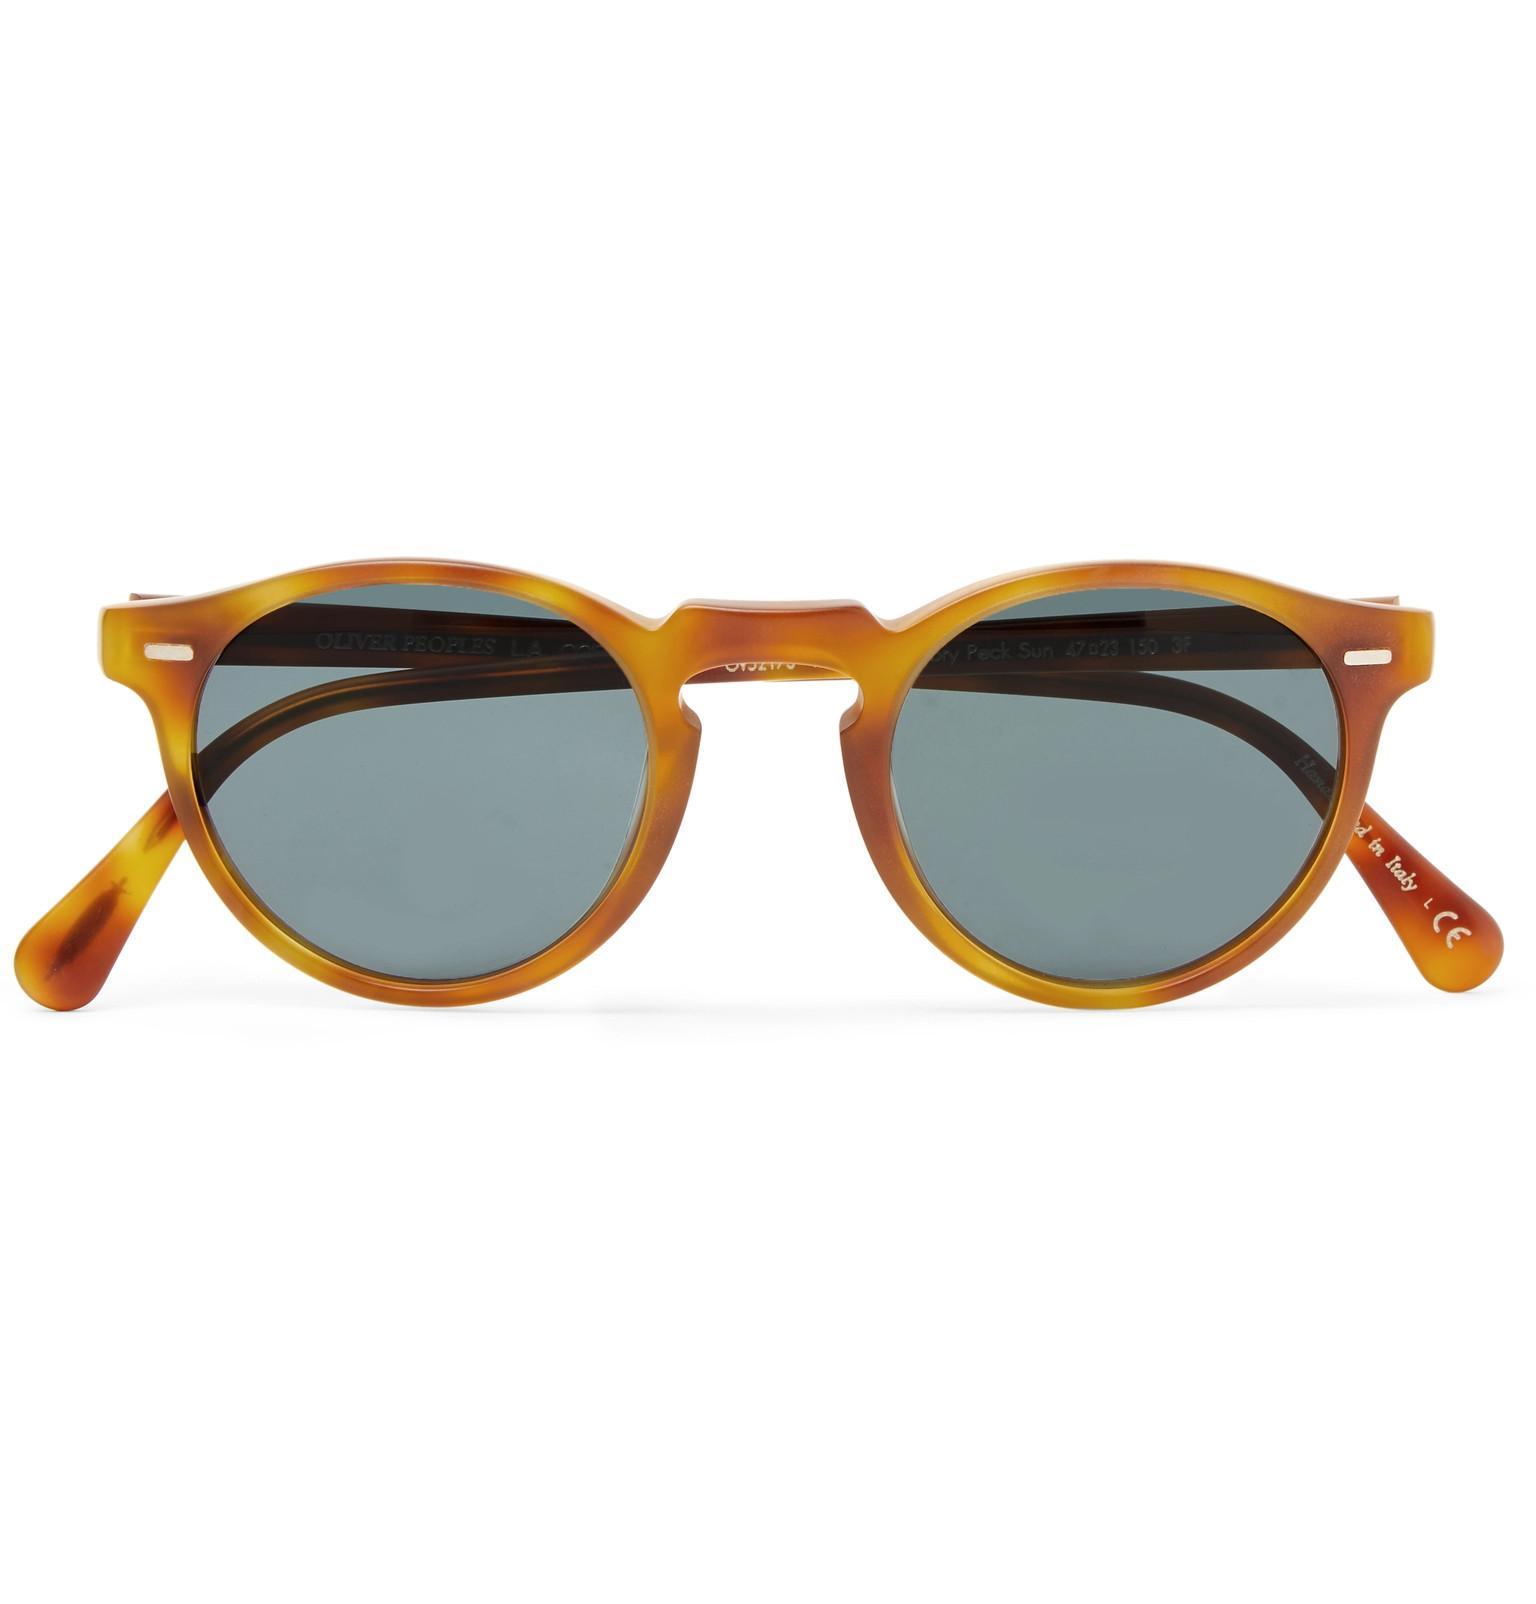 e4b859f418 Oliver Peoples. Men s Brown Gregory Peck Round-frame Tortoiseshell Acetate  Photochromic Sunglasses